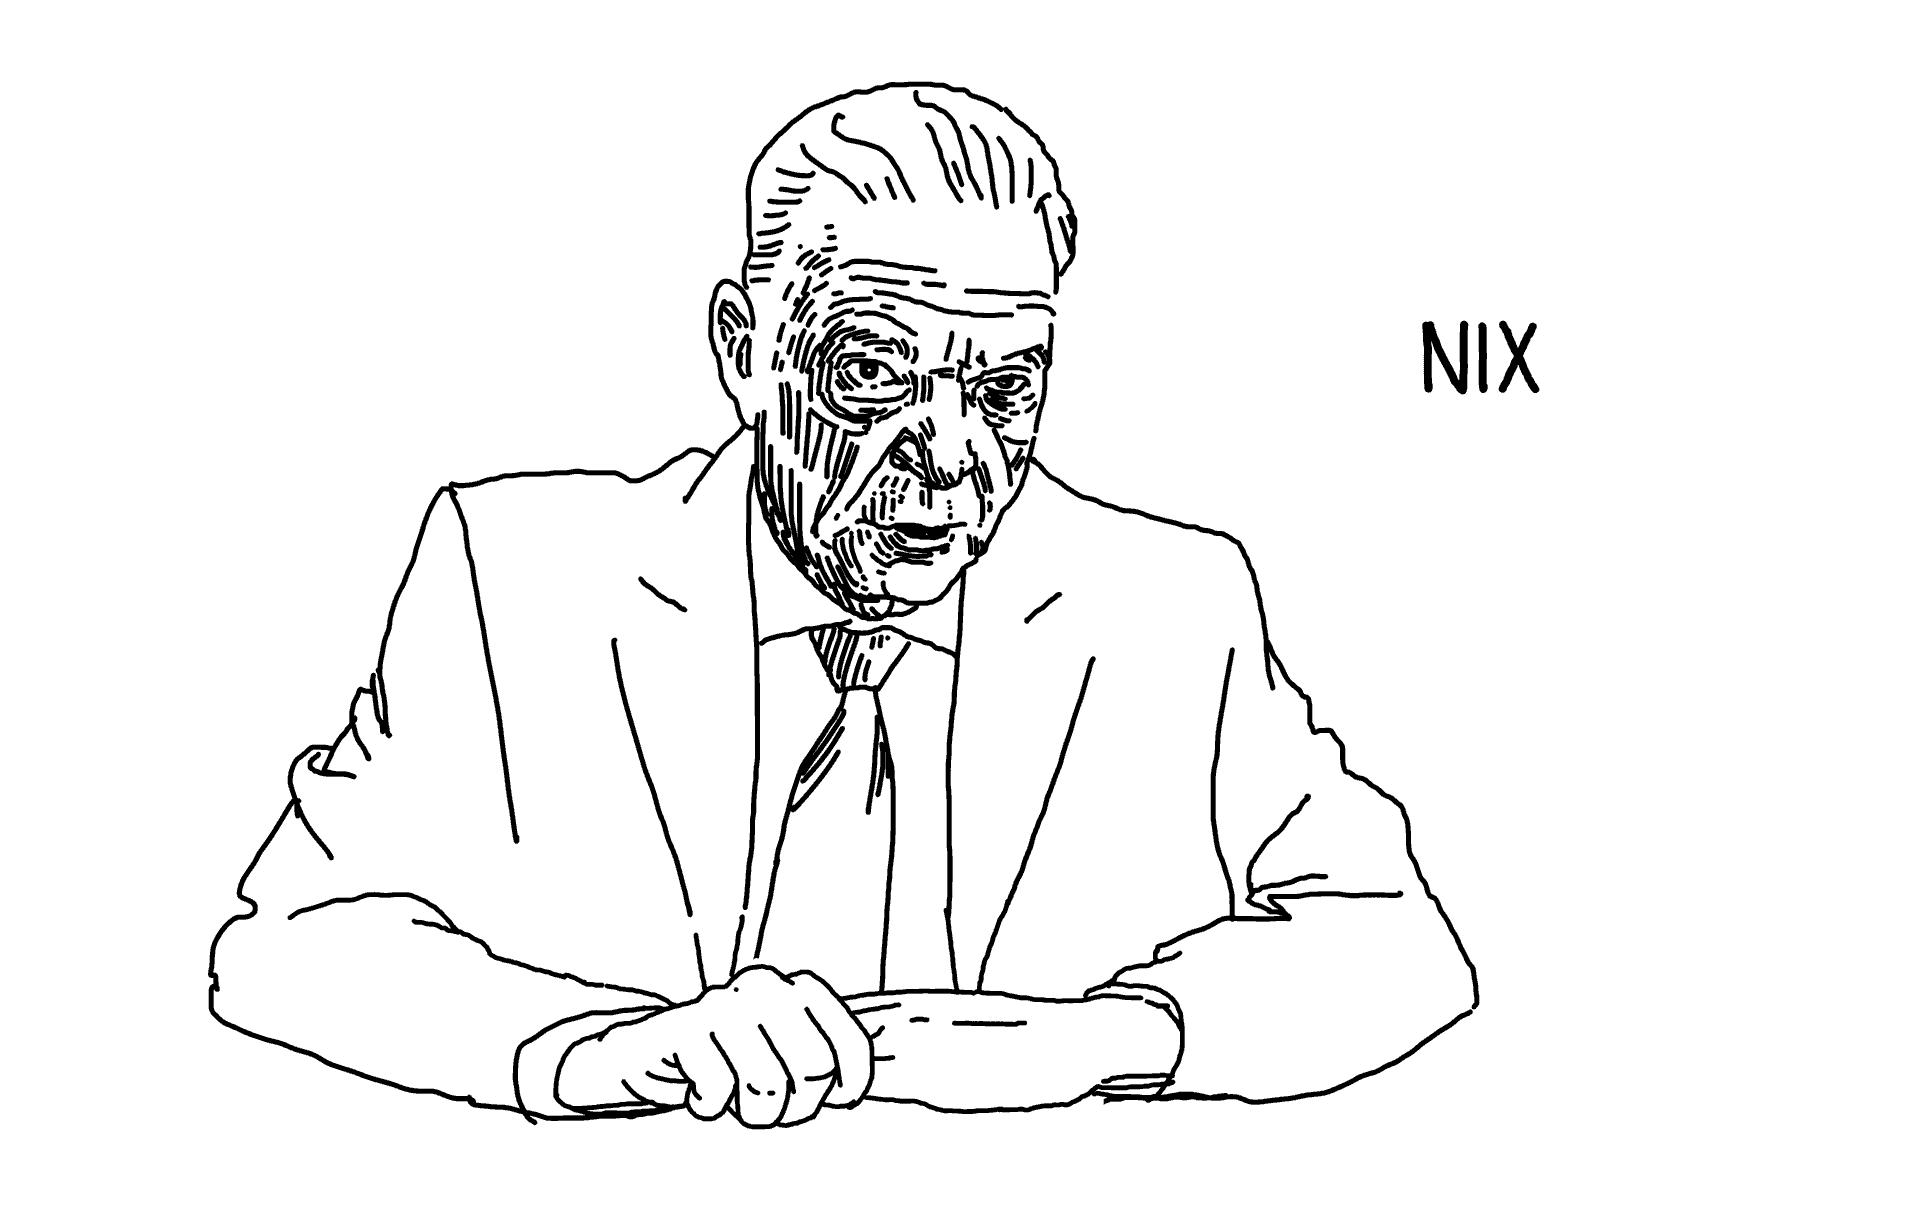 Gar nix.